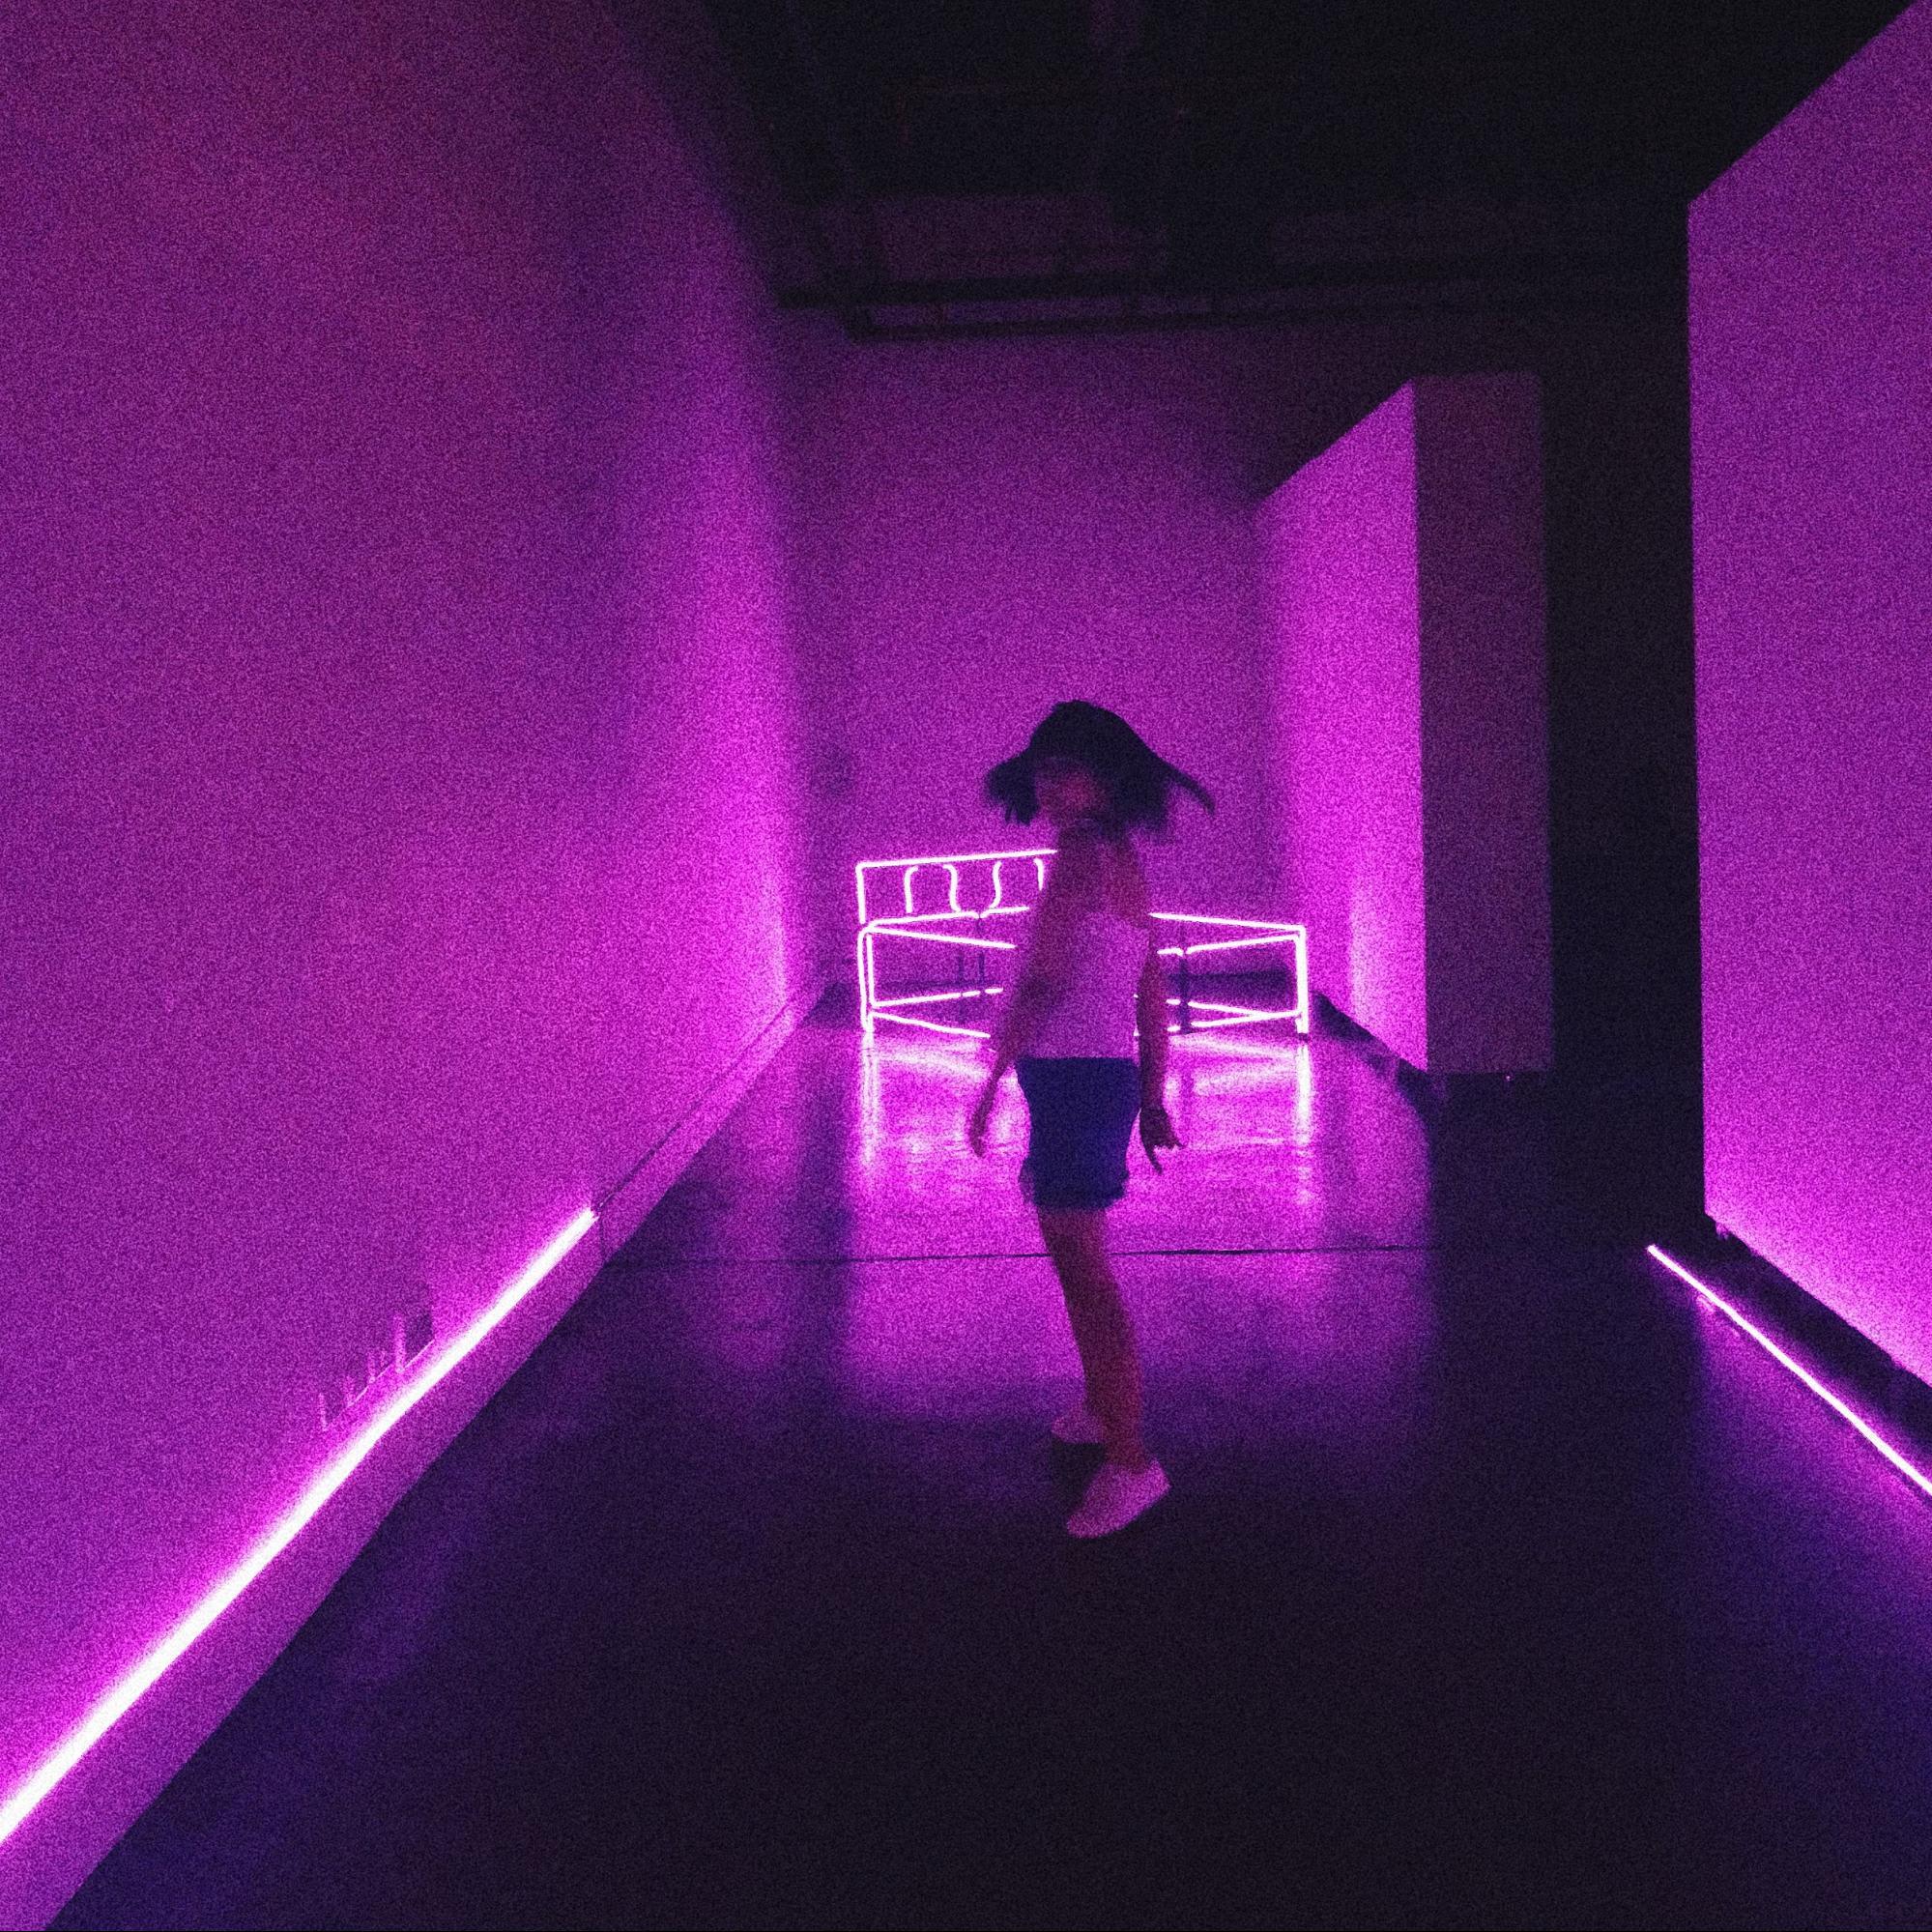 sống ảo tại bangkok art & culture center